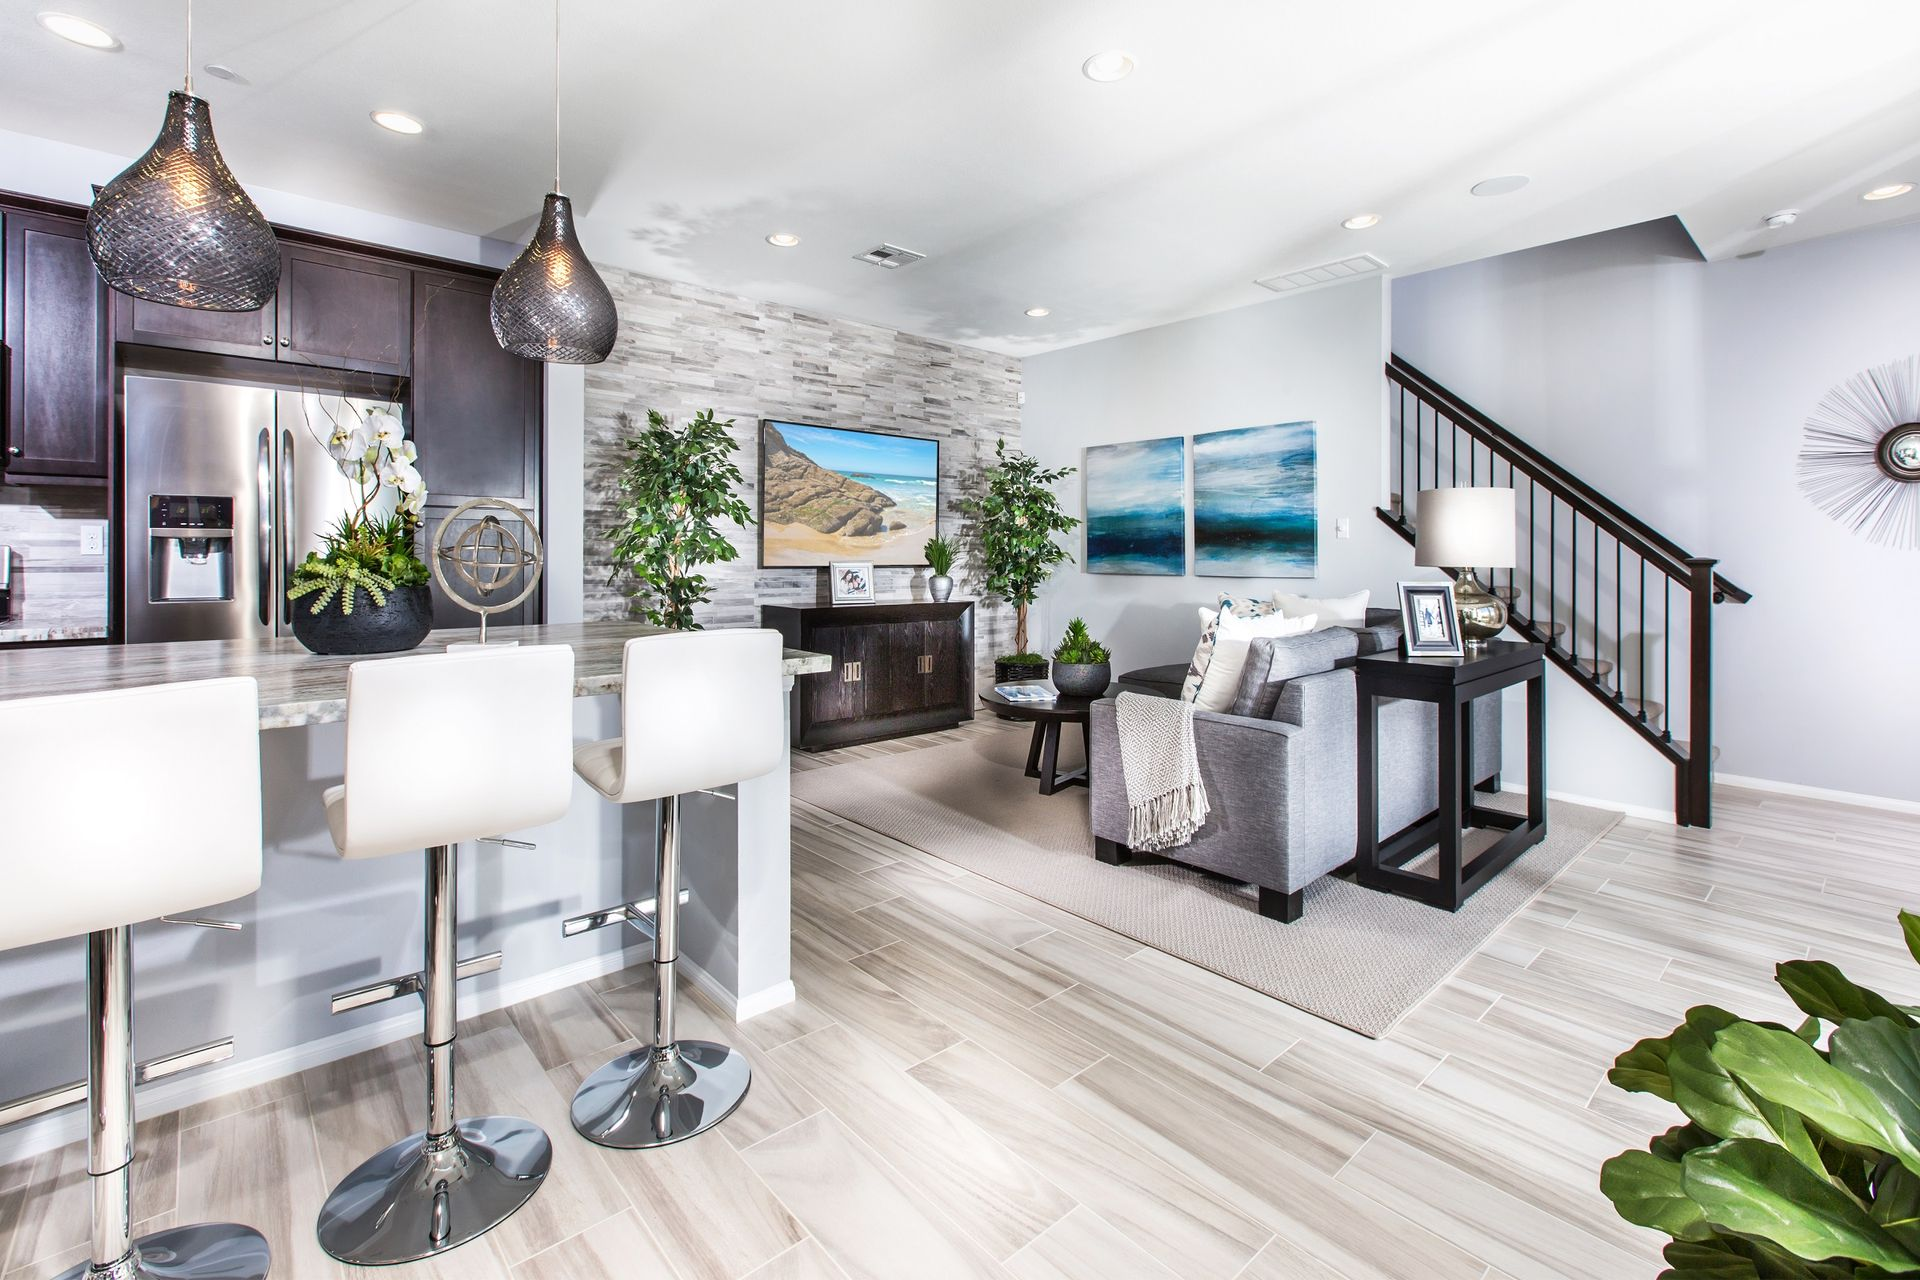 Enclave in Ventura, CA, New Homes & Floor Plans by Watt Communities